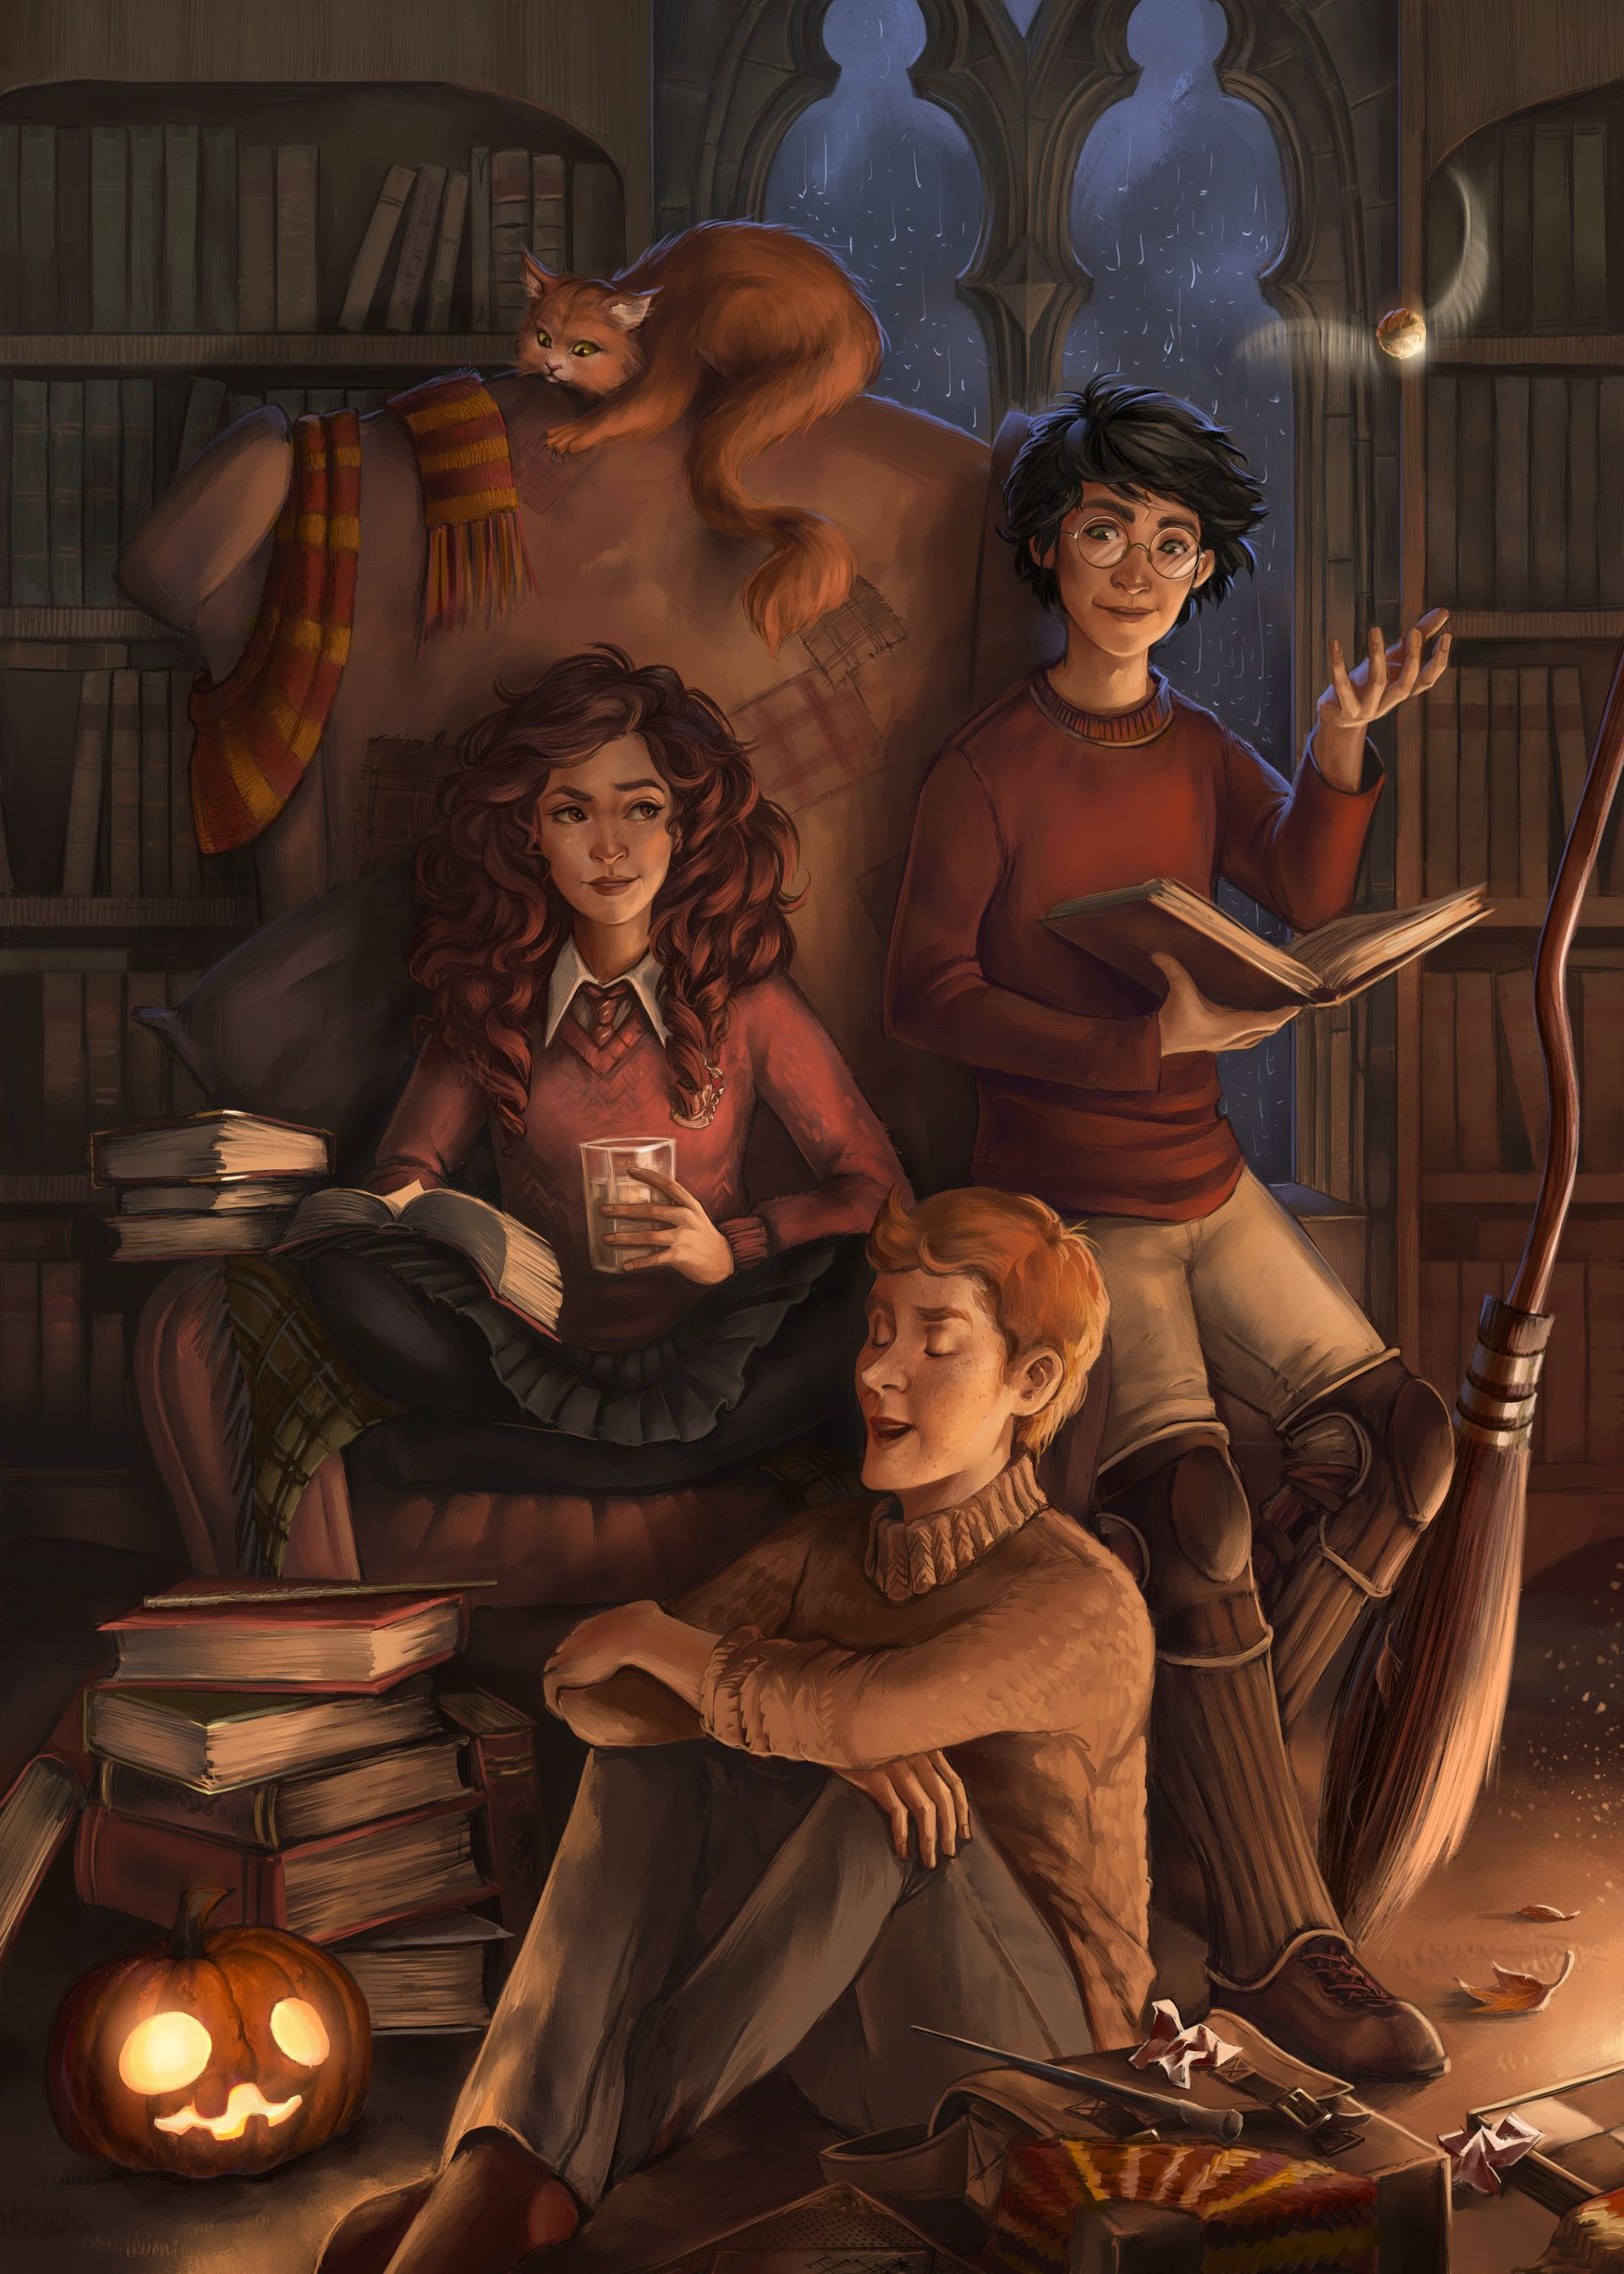 Artstation Golden Trio Kartstation Golden Trio K K Harry Potter Anime Harry Potter Fanlari Harry Potter Esprileri